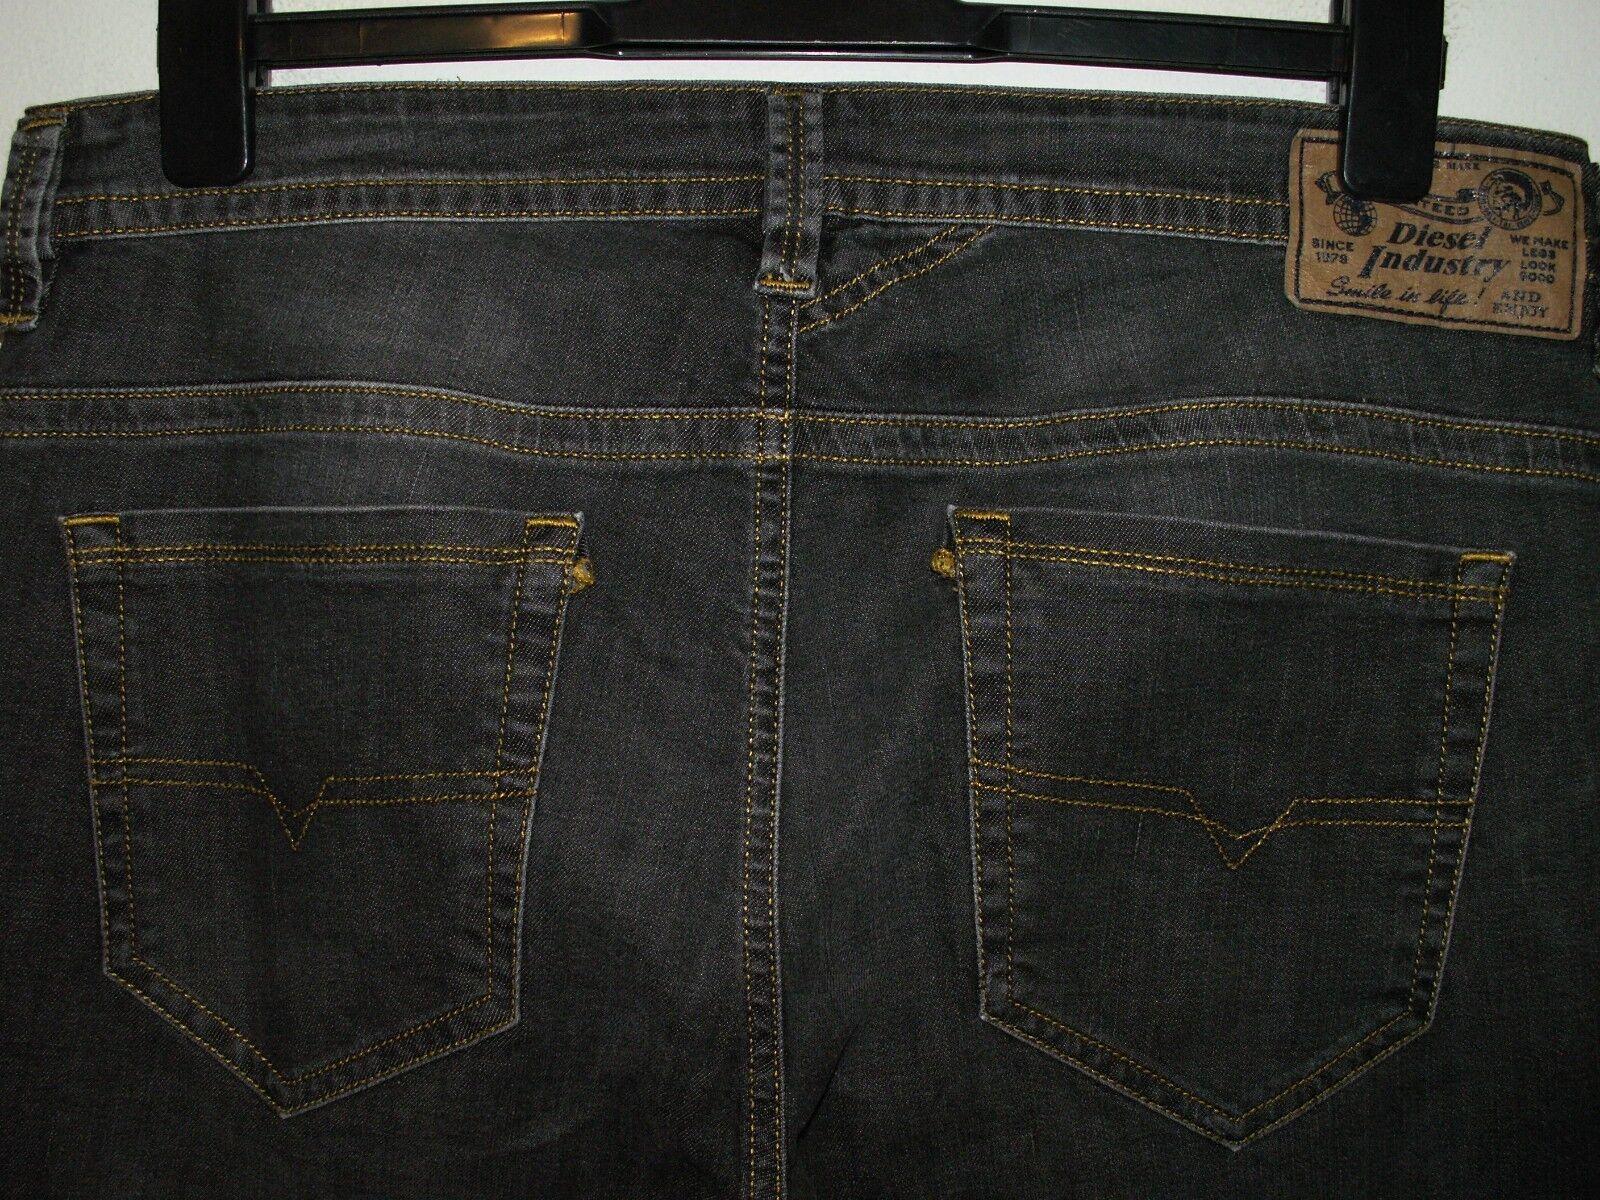 Diesel thavar slim-skinny fit jeans wash SR050 stretch W33 L32 (a4426)